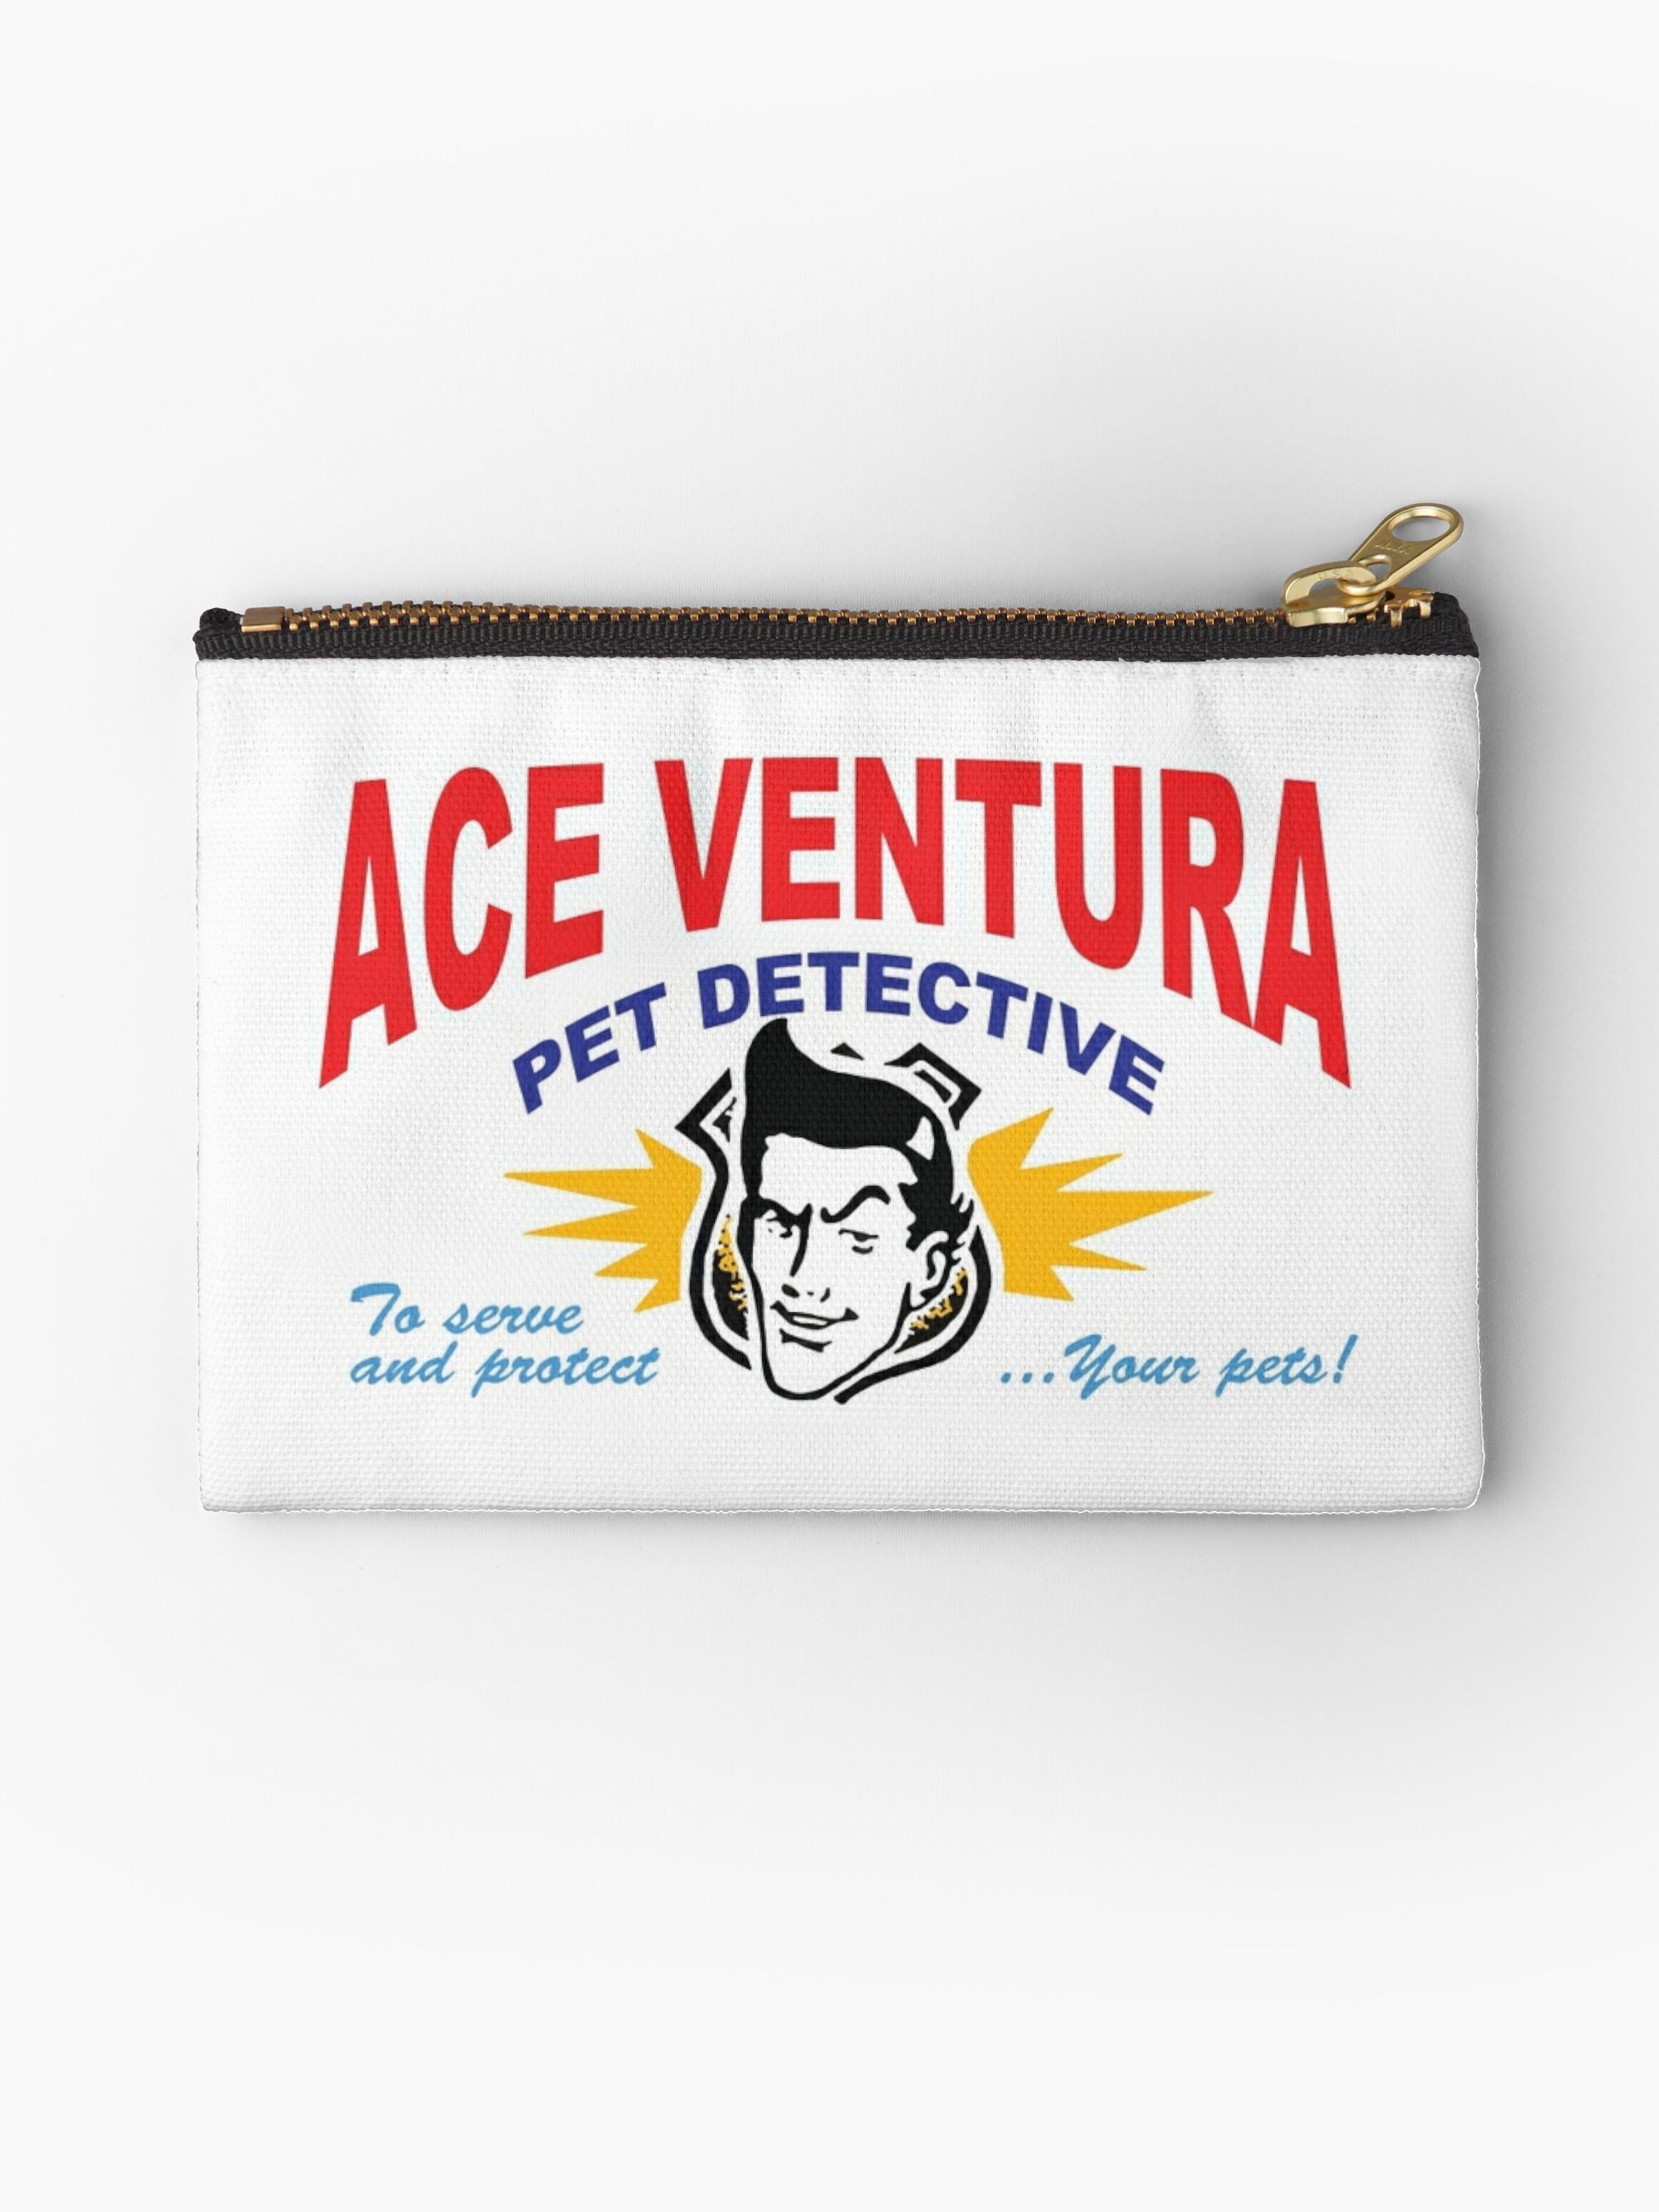 Ace Ventura Pet Detective shirt (Business Card)\